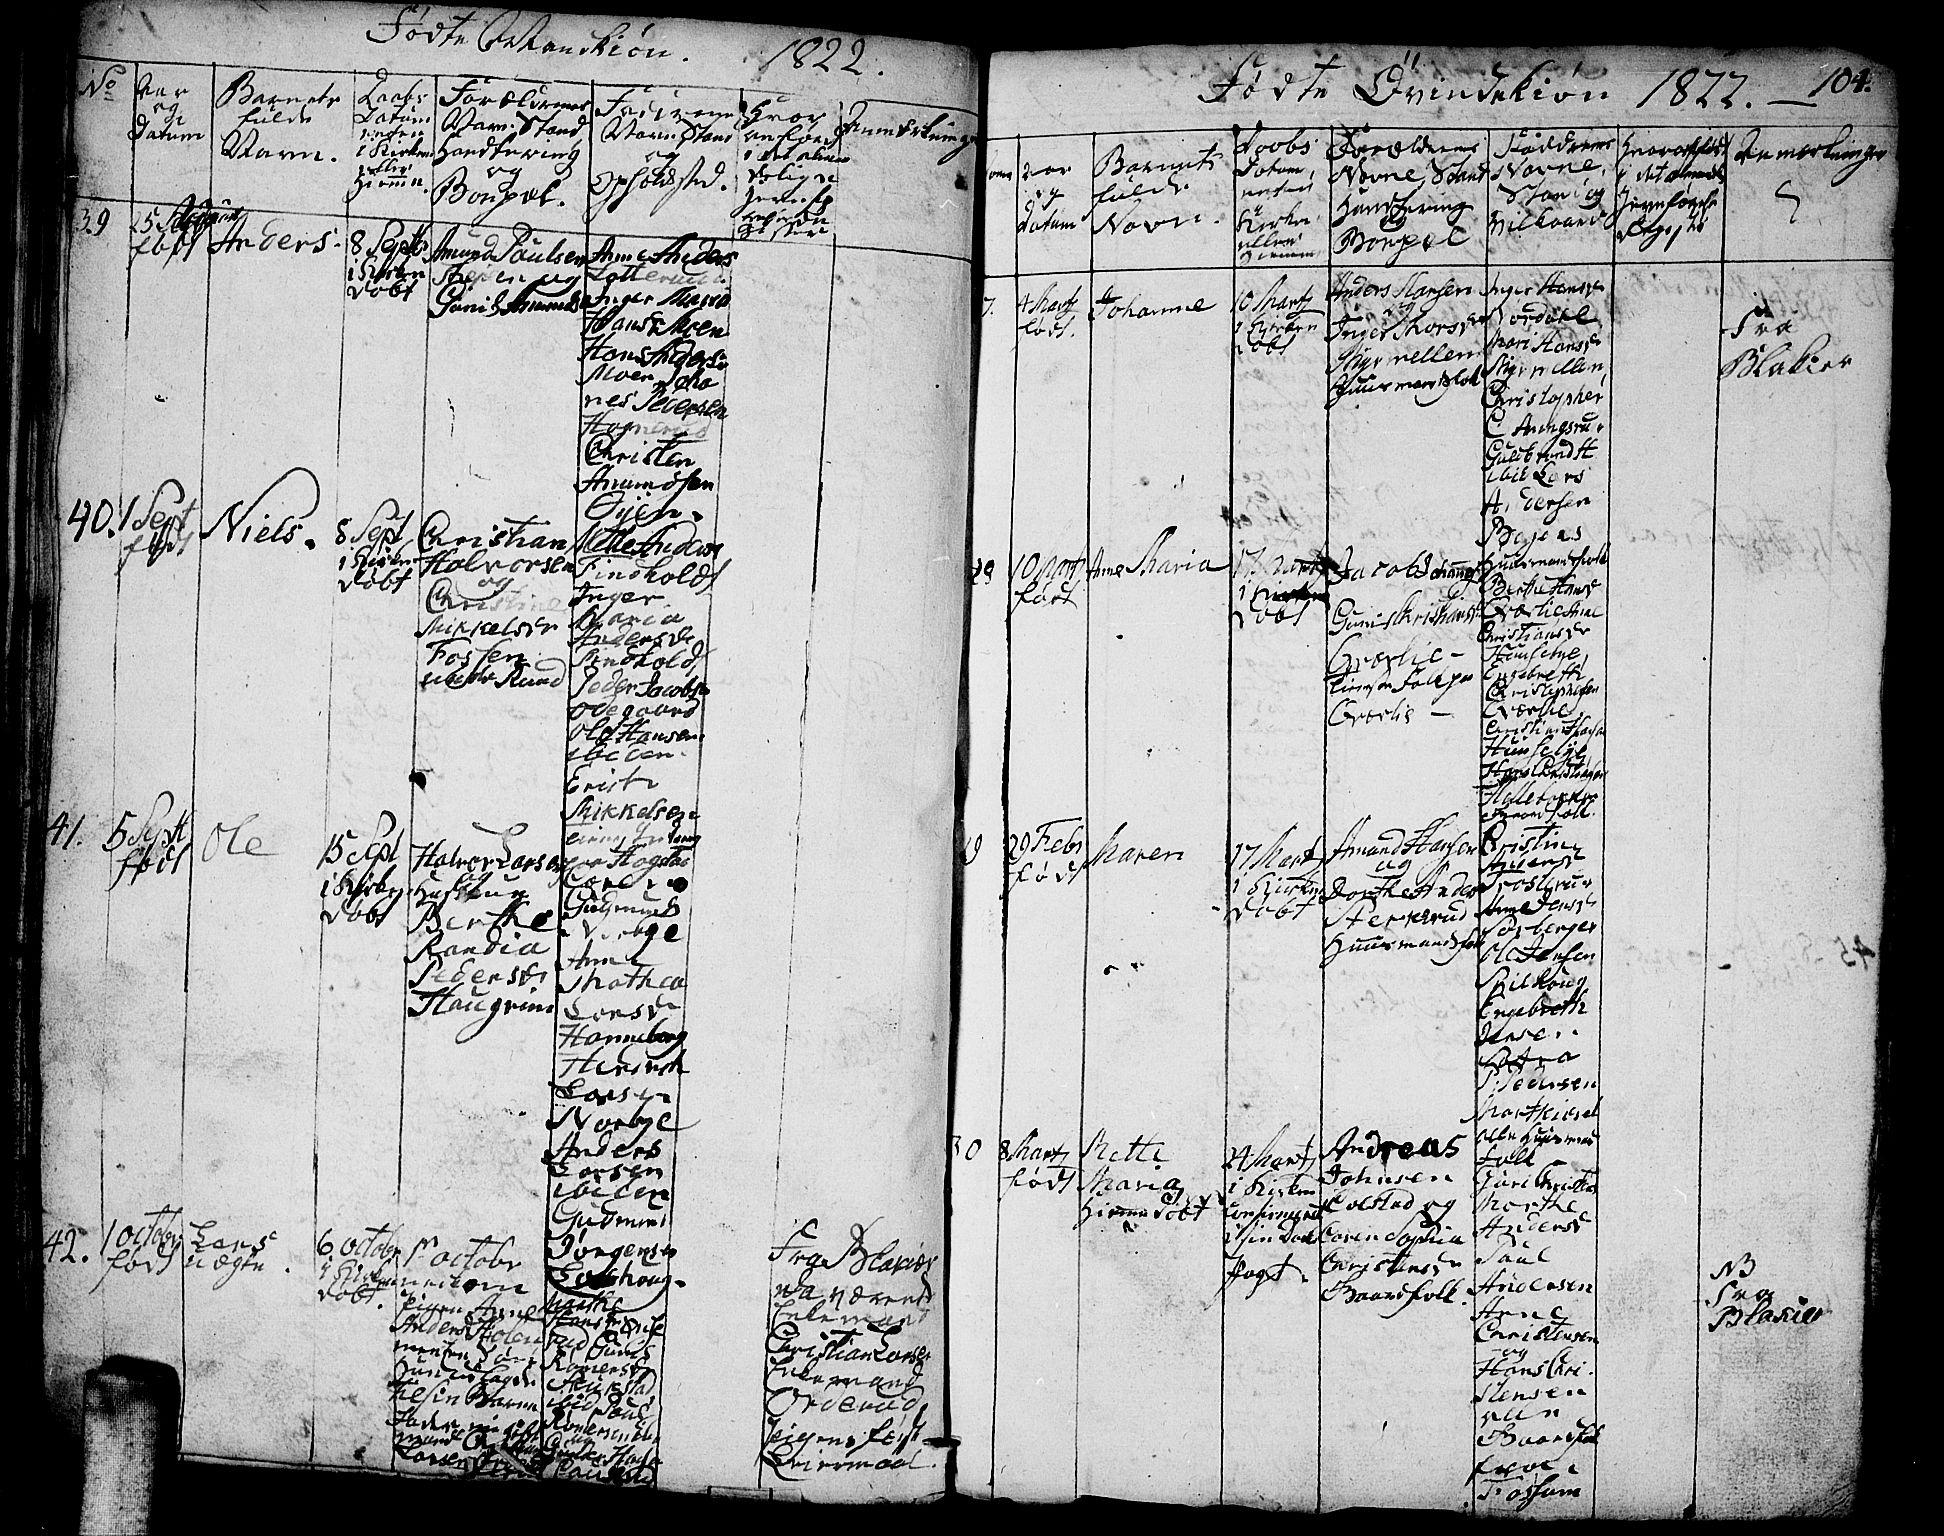 SAO, Aurskog prestekontor Kirkebøker, F/Fa/L0005: Ministerialbok nr. I 5, 1814-1829, s. 104